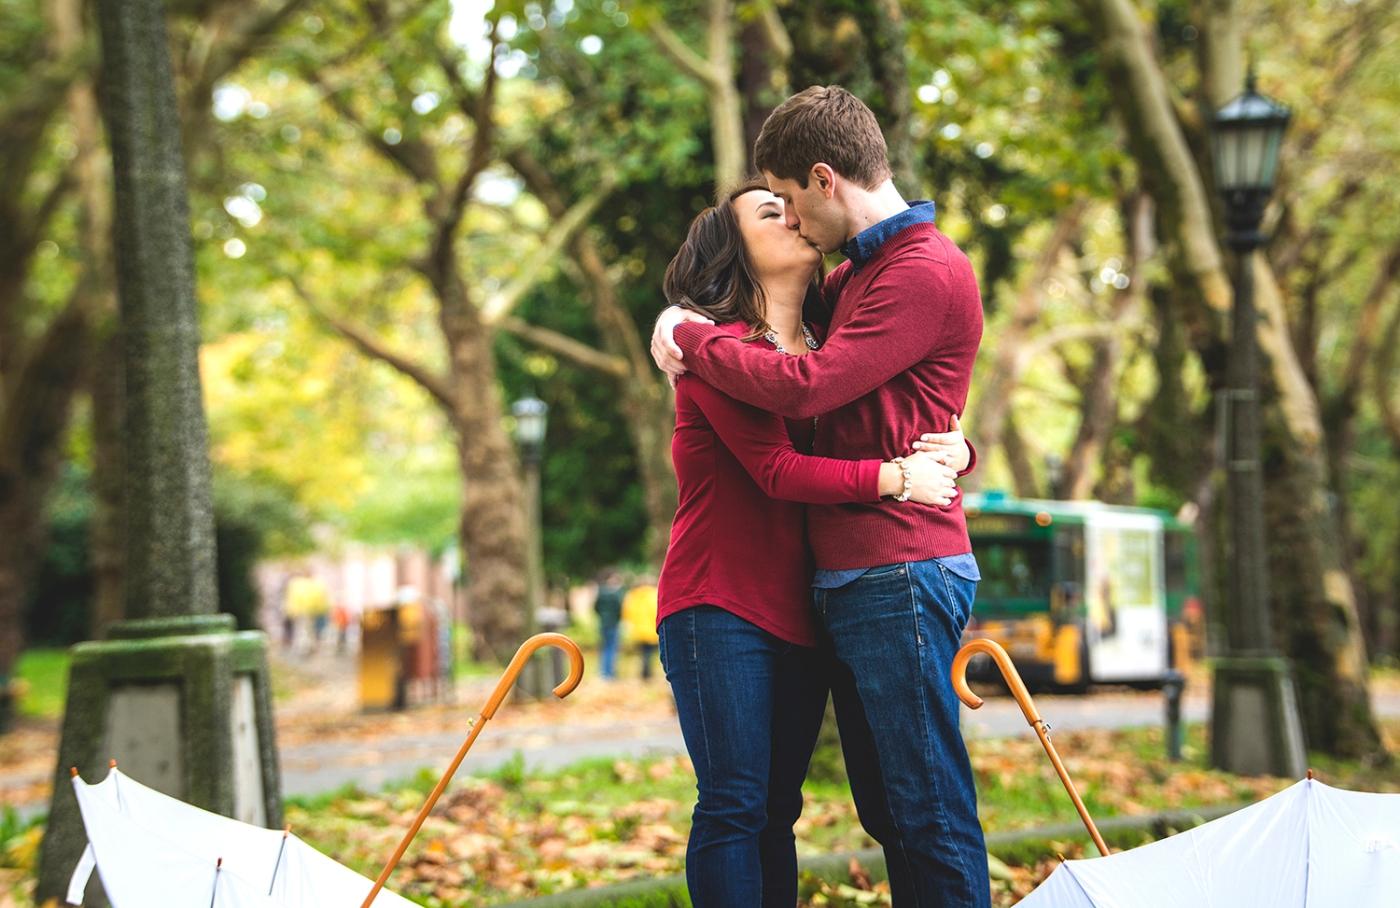 Engagement-UW-Lawcampus_Rebecca_and_Evan DSC_5564